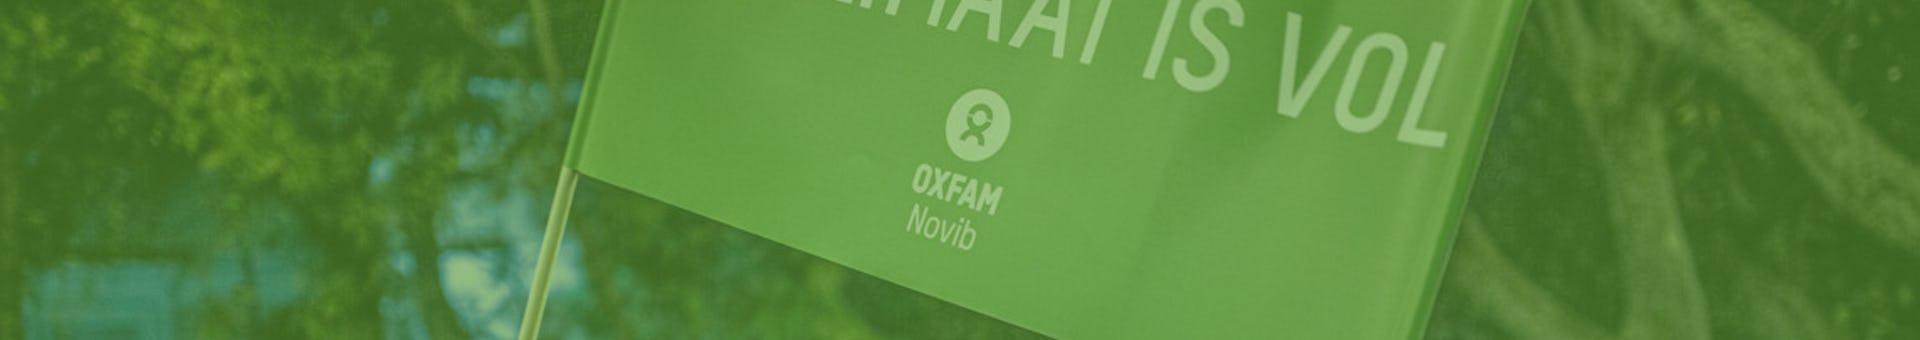 Oxfam novib banner